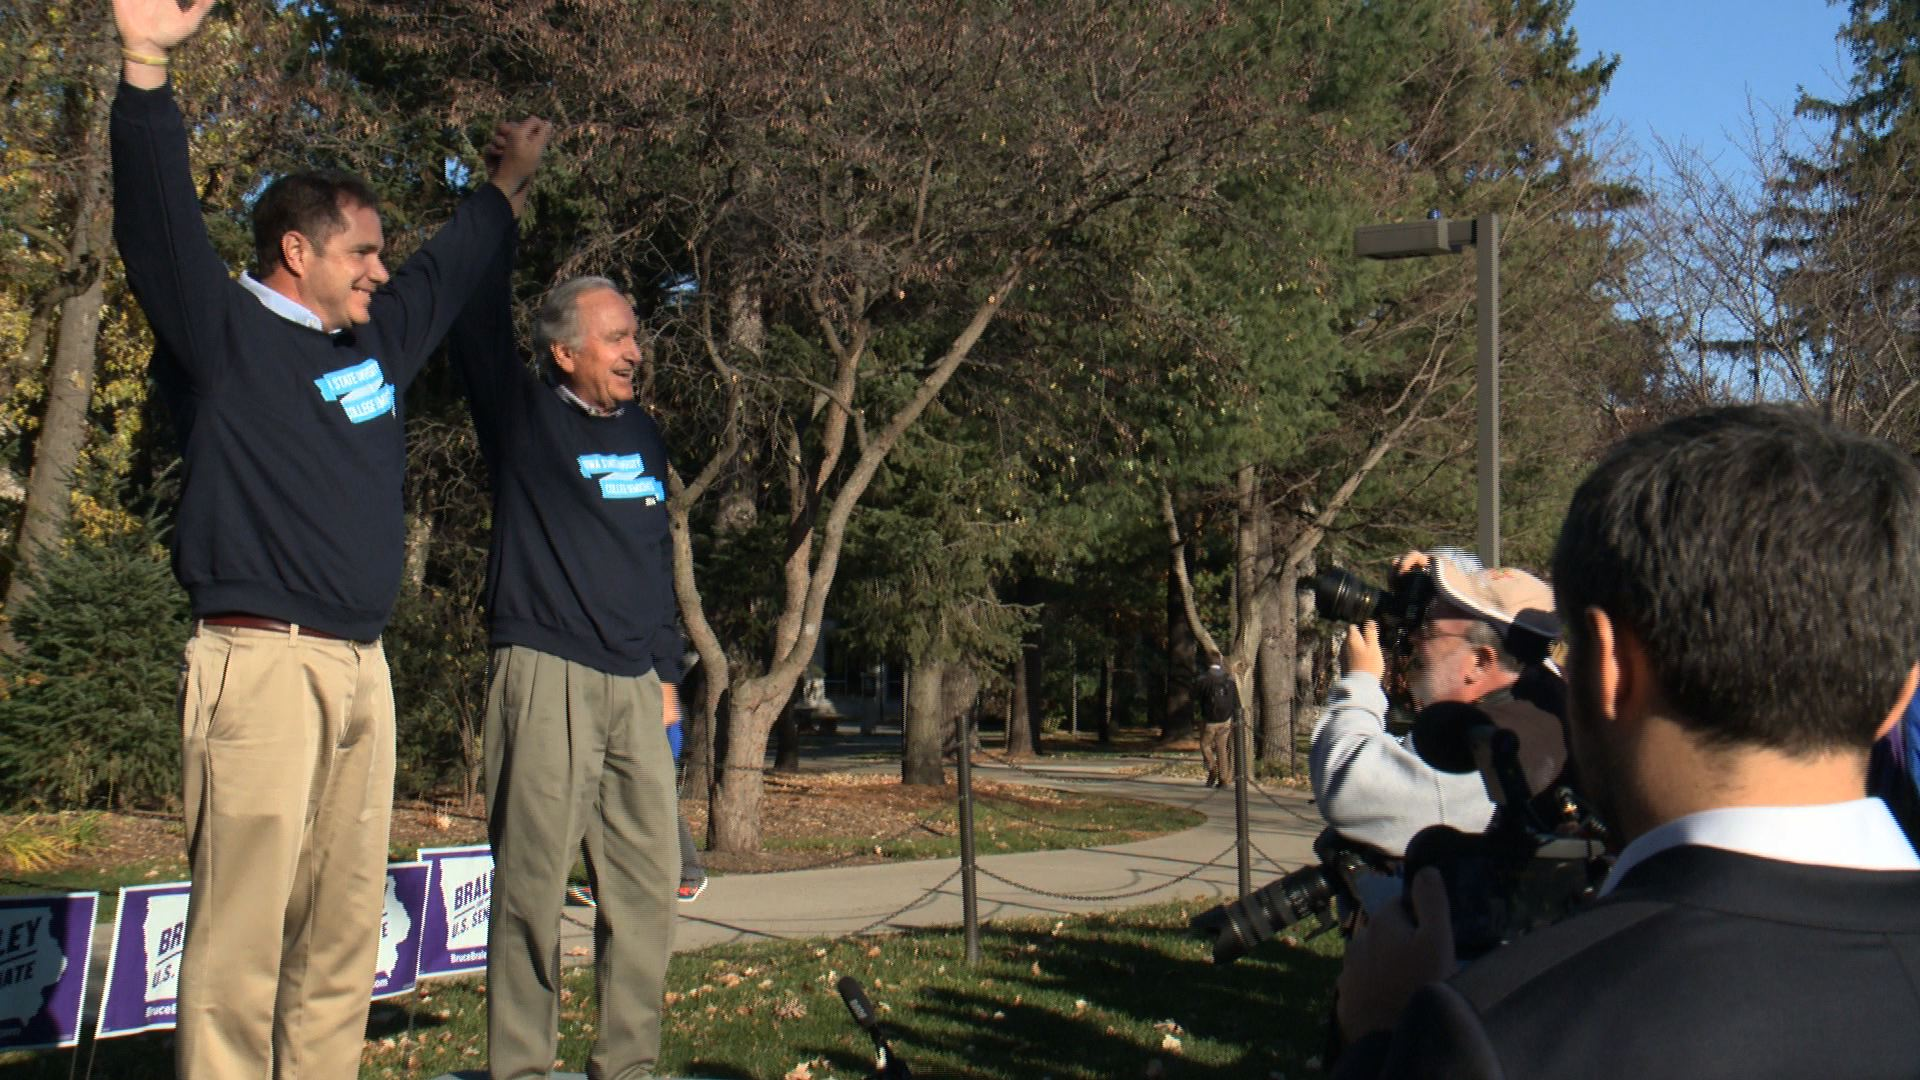 Senator Tom Harkin with Congressman Bruce Braley at a rally on the Iowa State University Campus